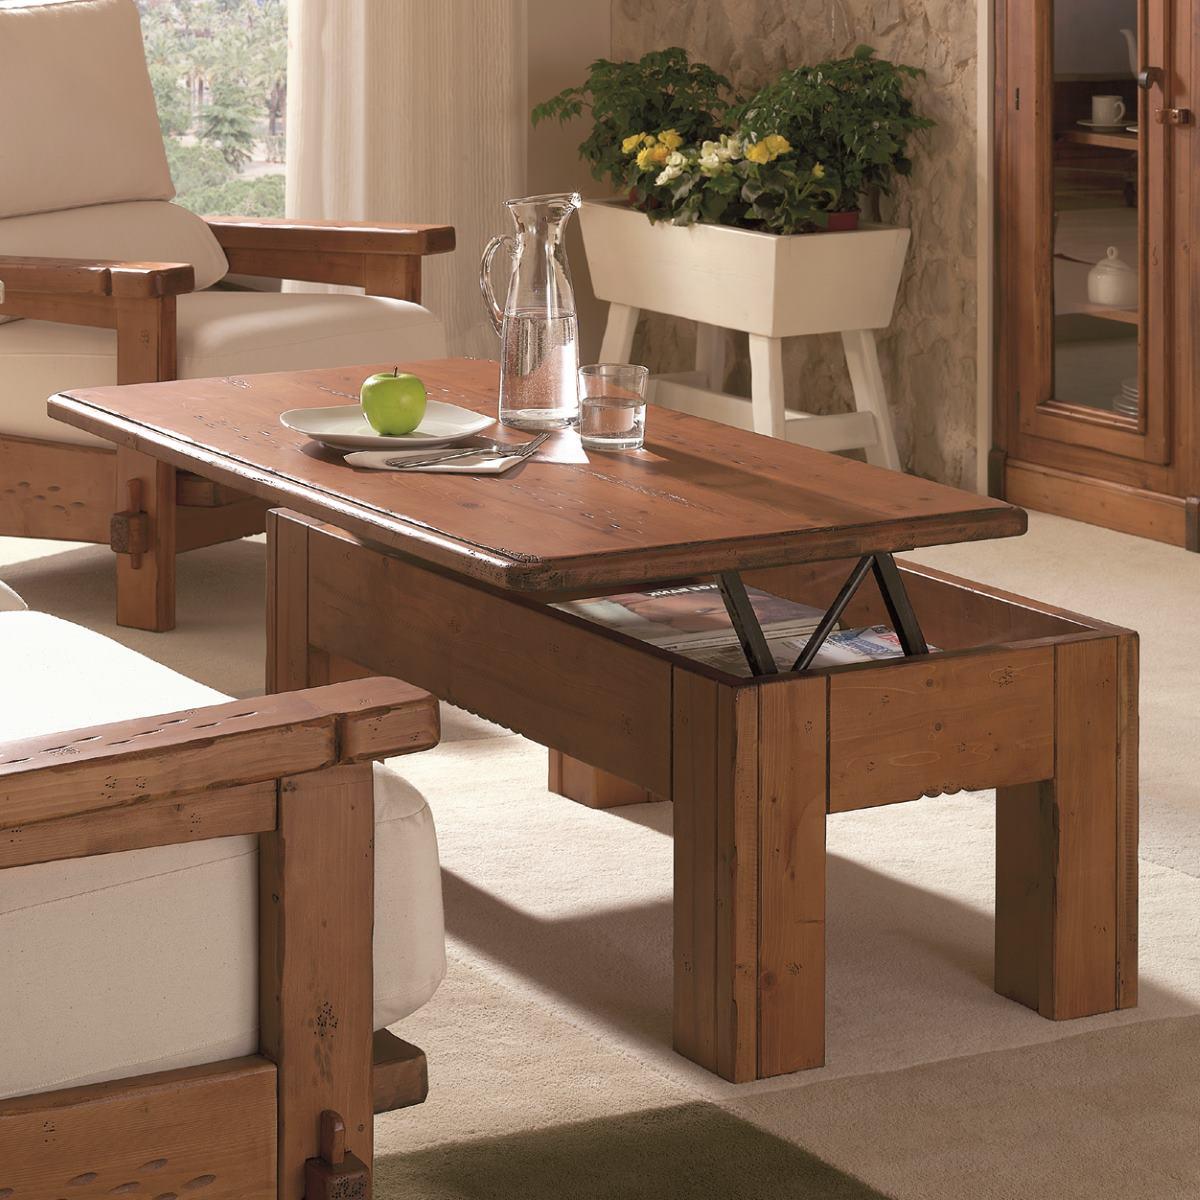 Mesa de centro r stica elevable ecor stico venta de muebles for Mesas de centro rusticas baratas